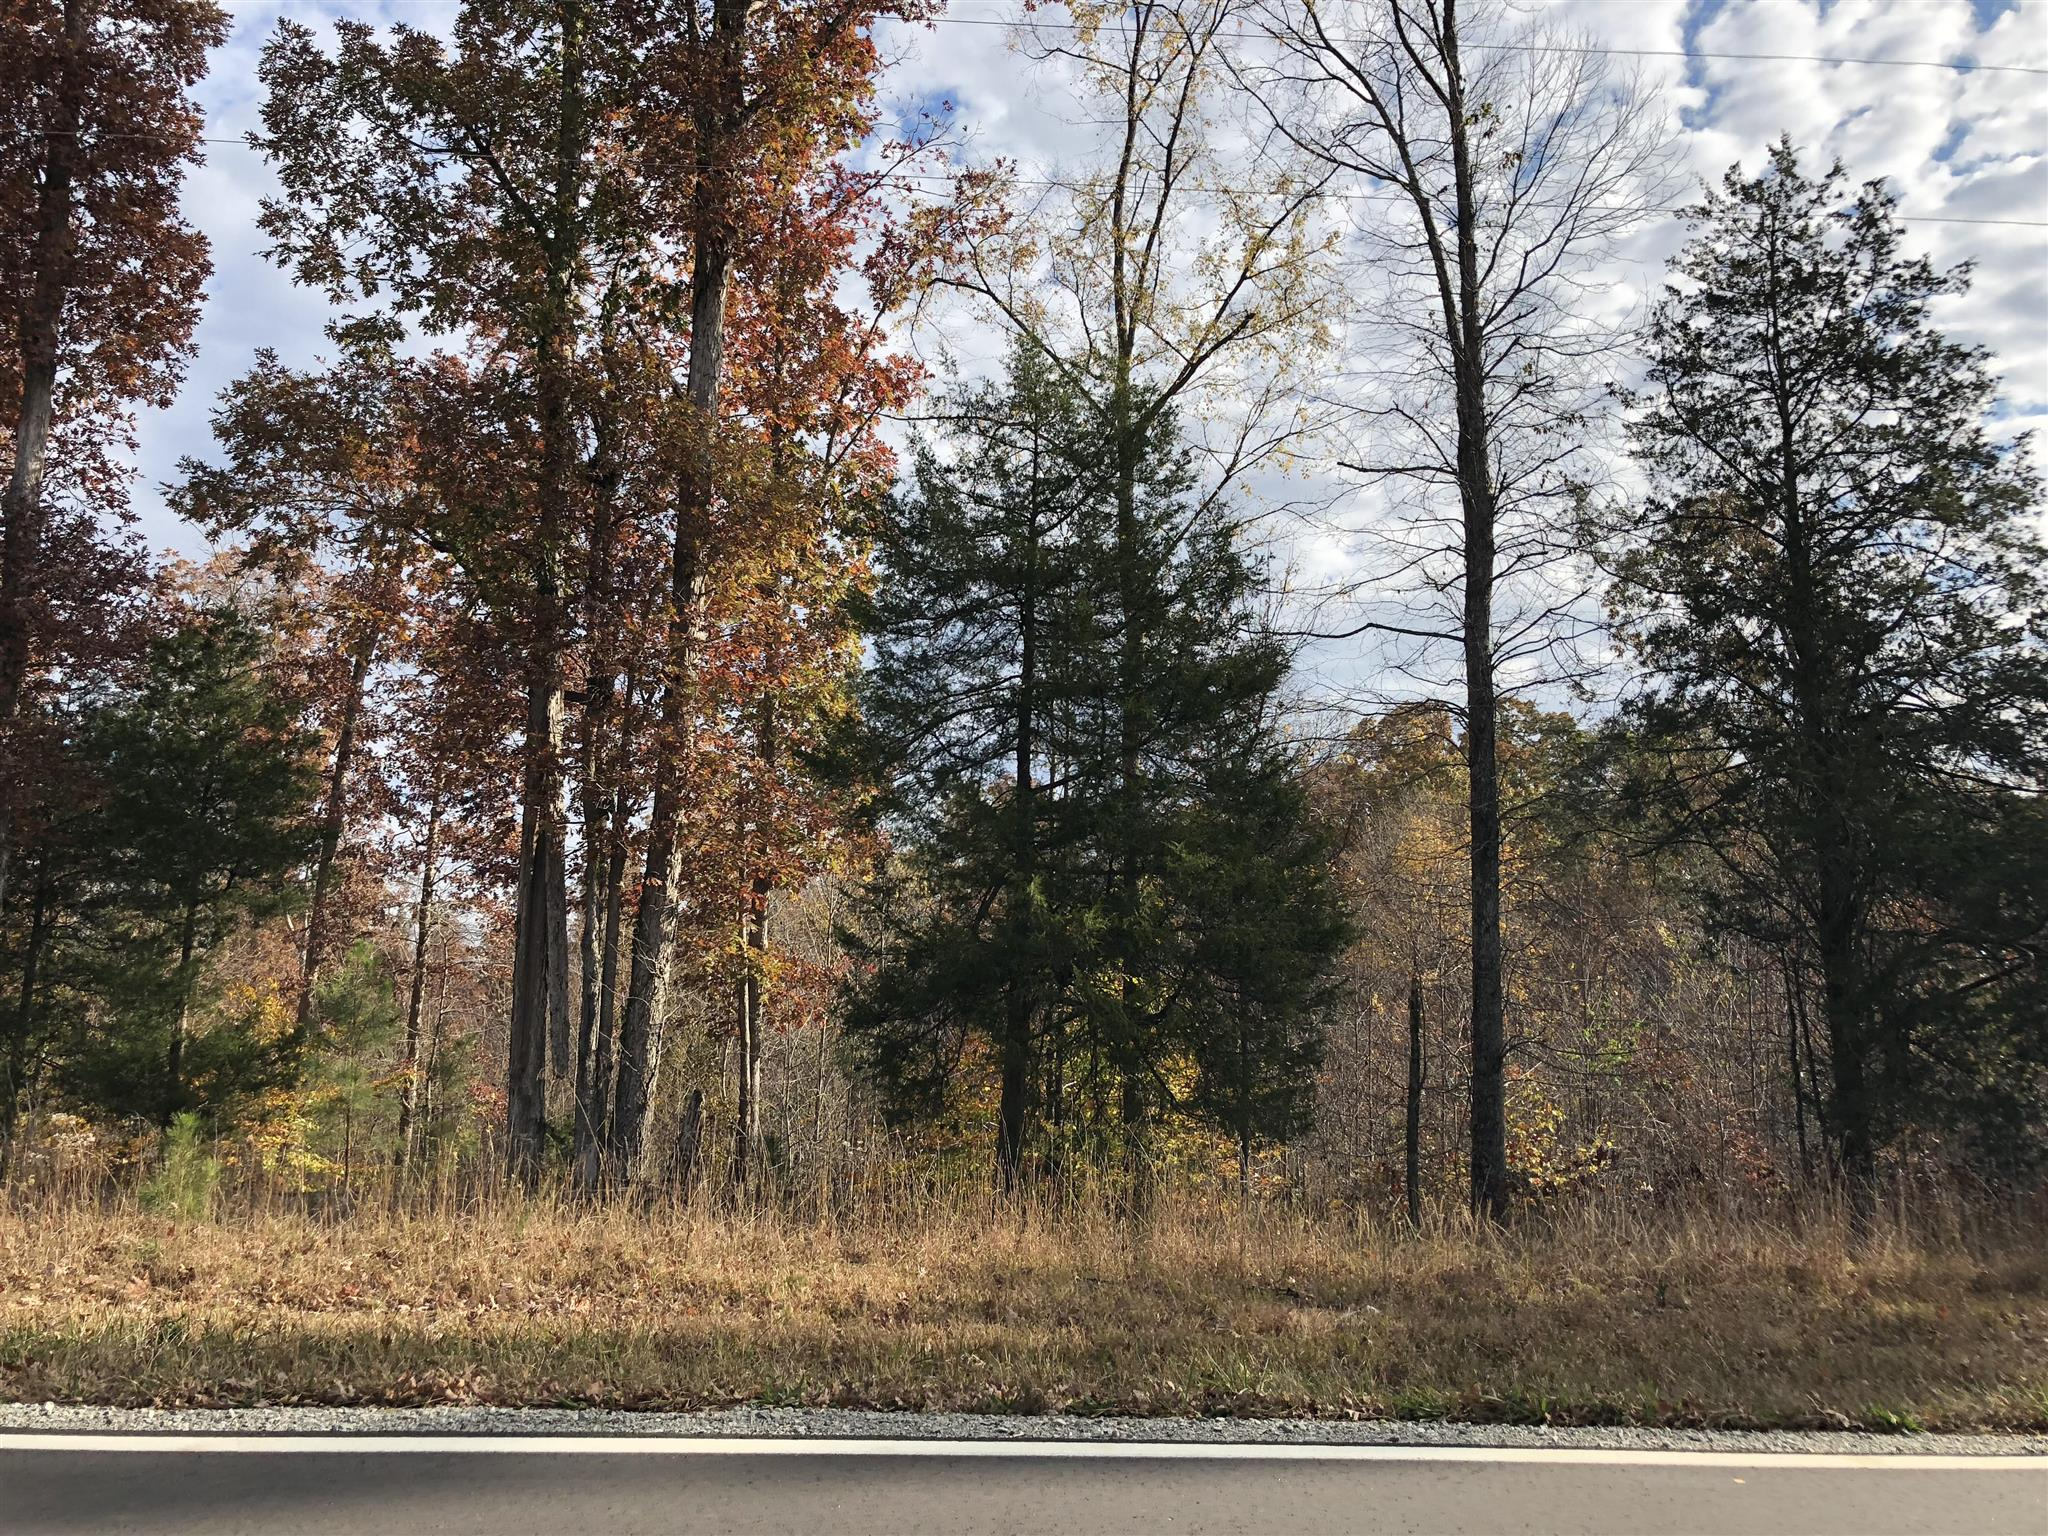 0 Highway 104 N, Cedar Grove, TN 38321 - Cedar Grove, TN real estate listing